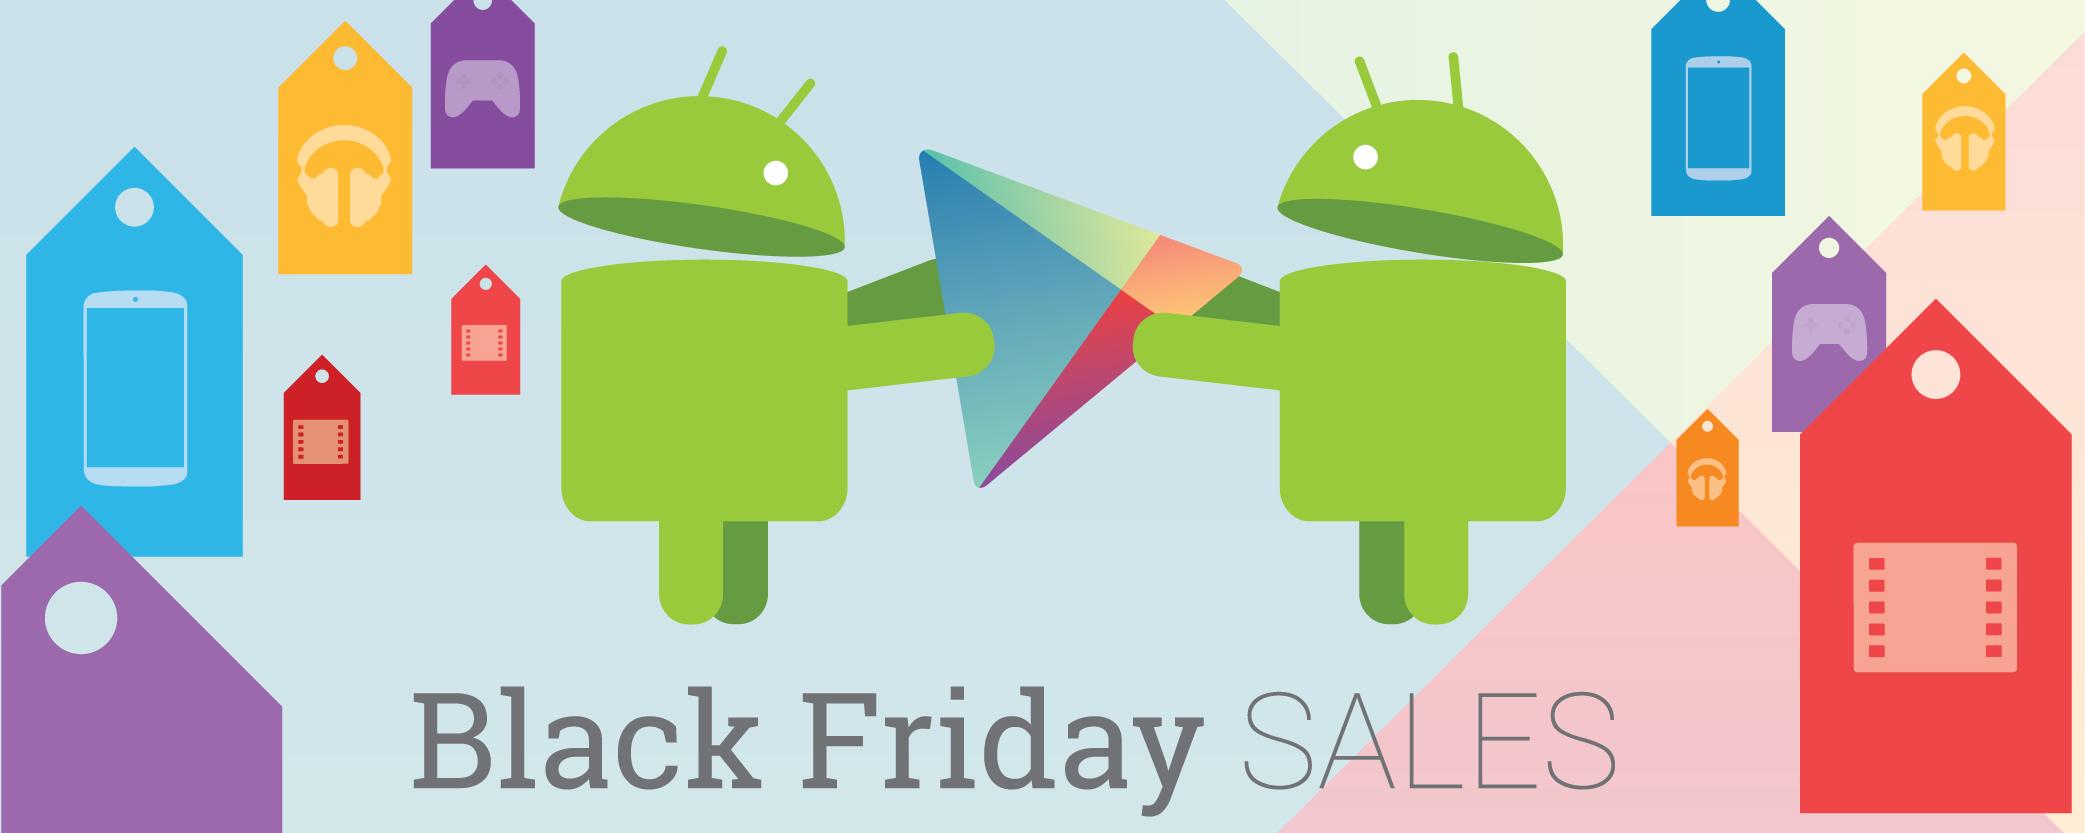 Nexus 9 deals black friday